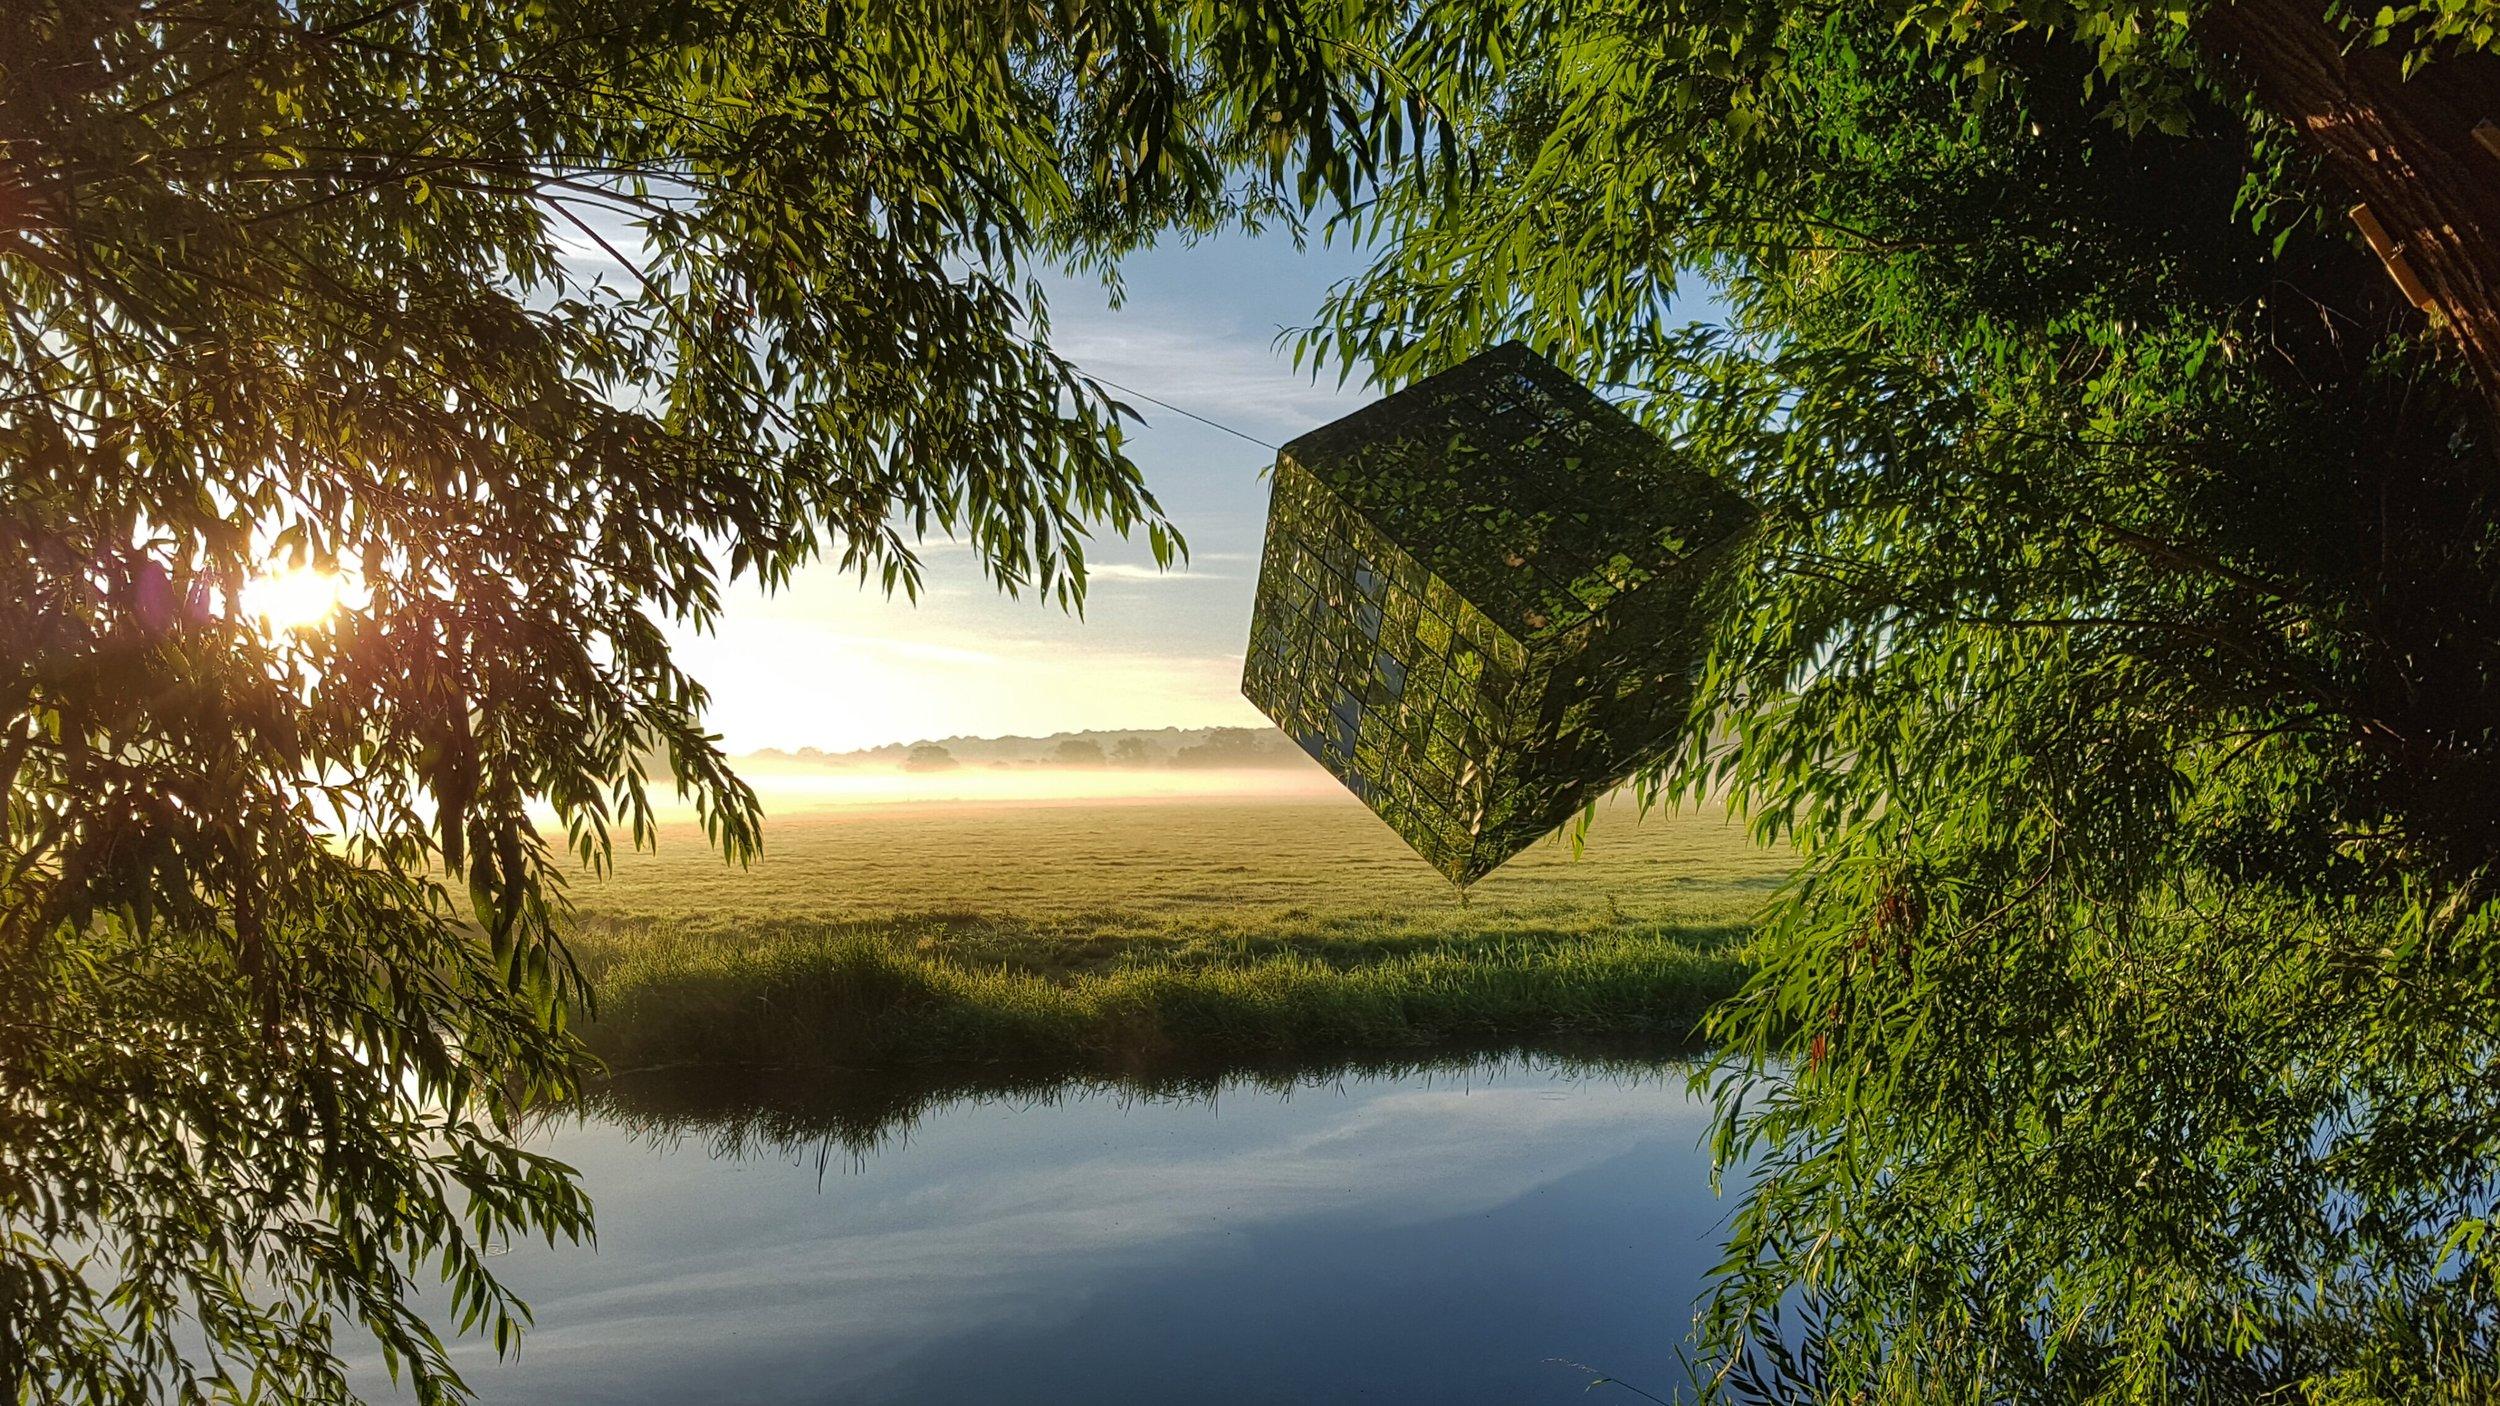 Waveney Glitch,  mirrored sculpture   by Brian Korteling (Norwich, UK)